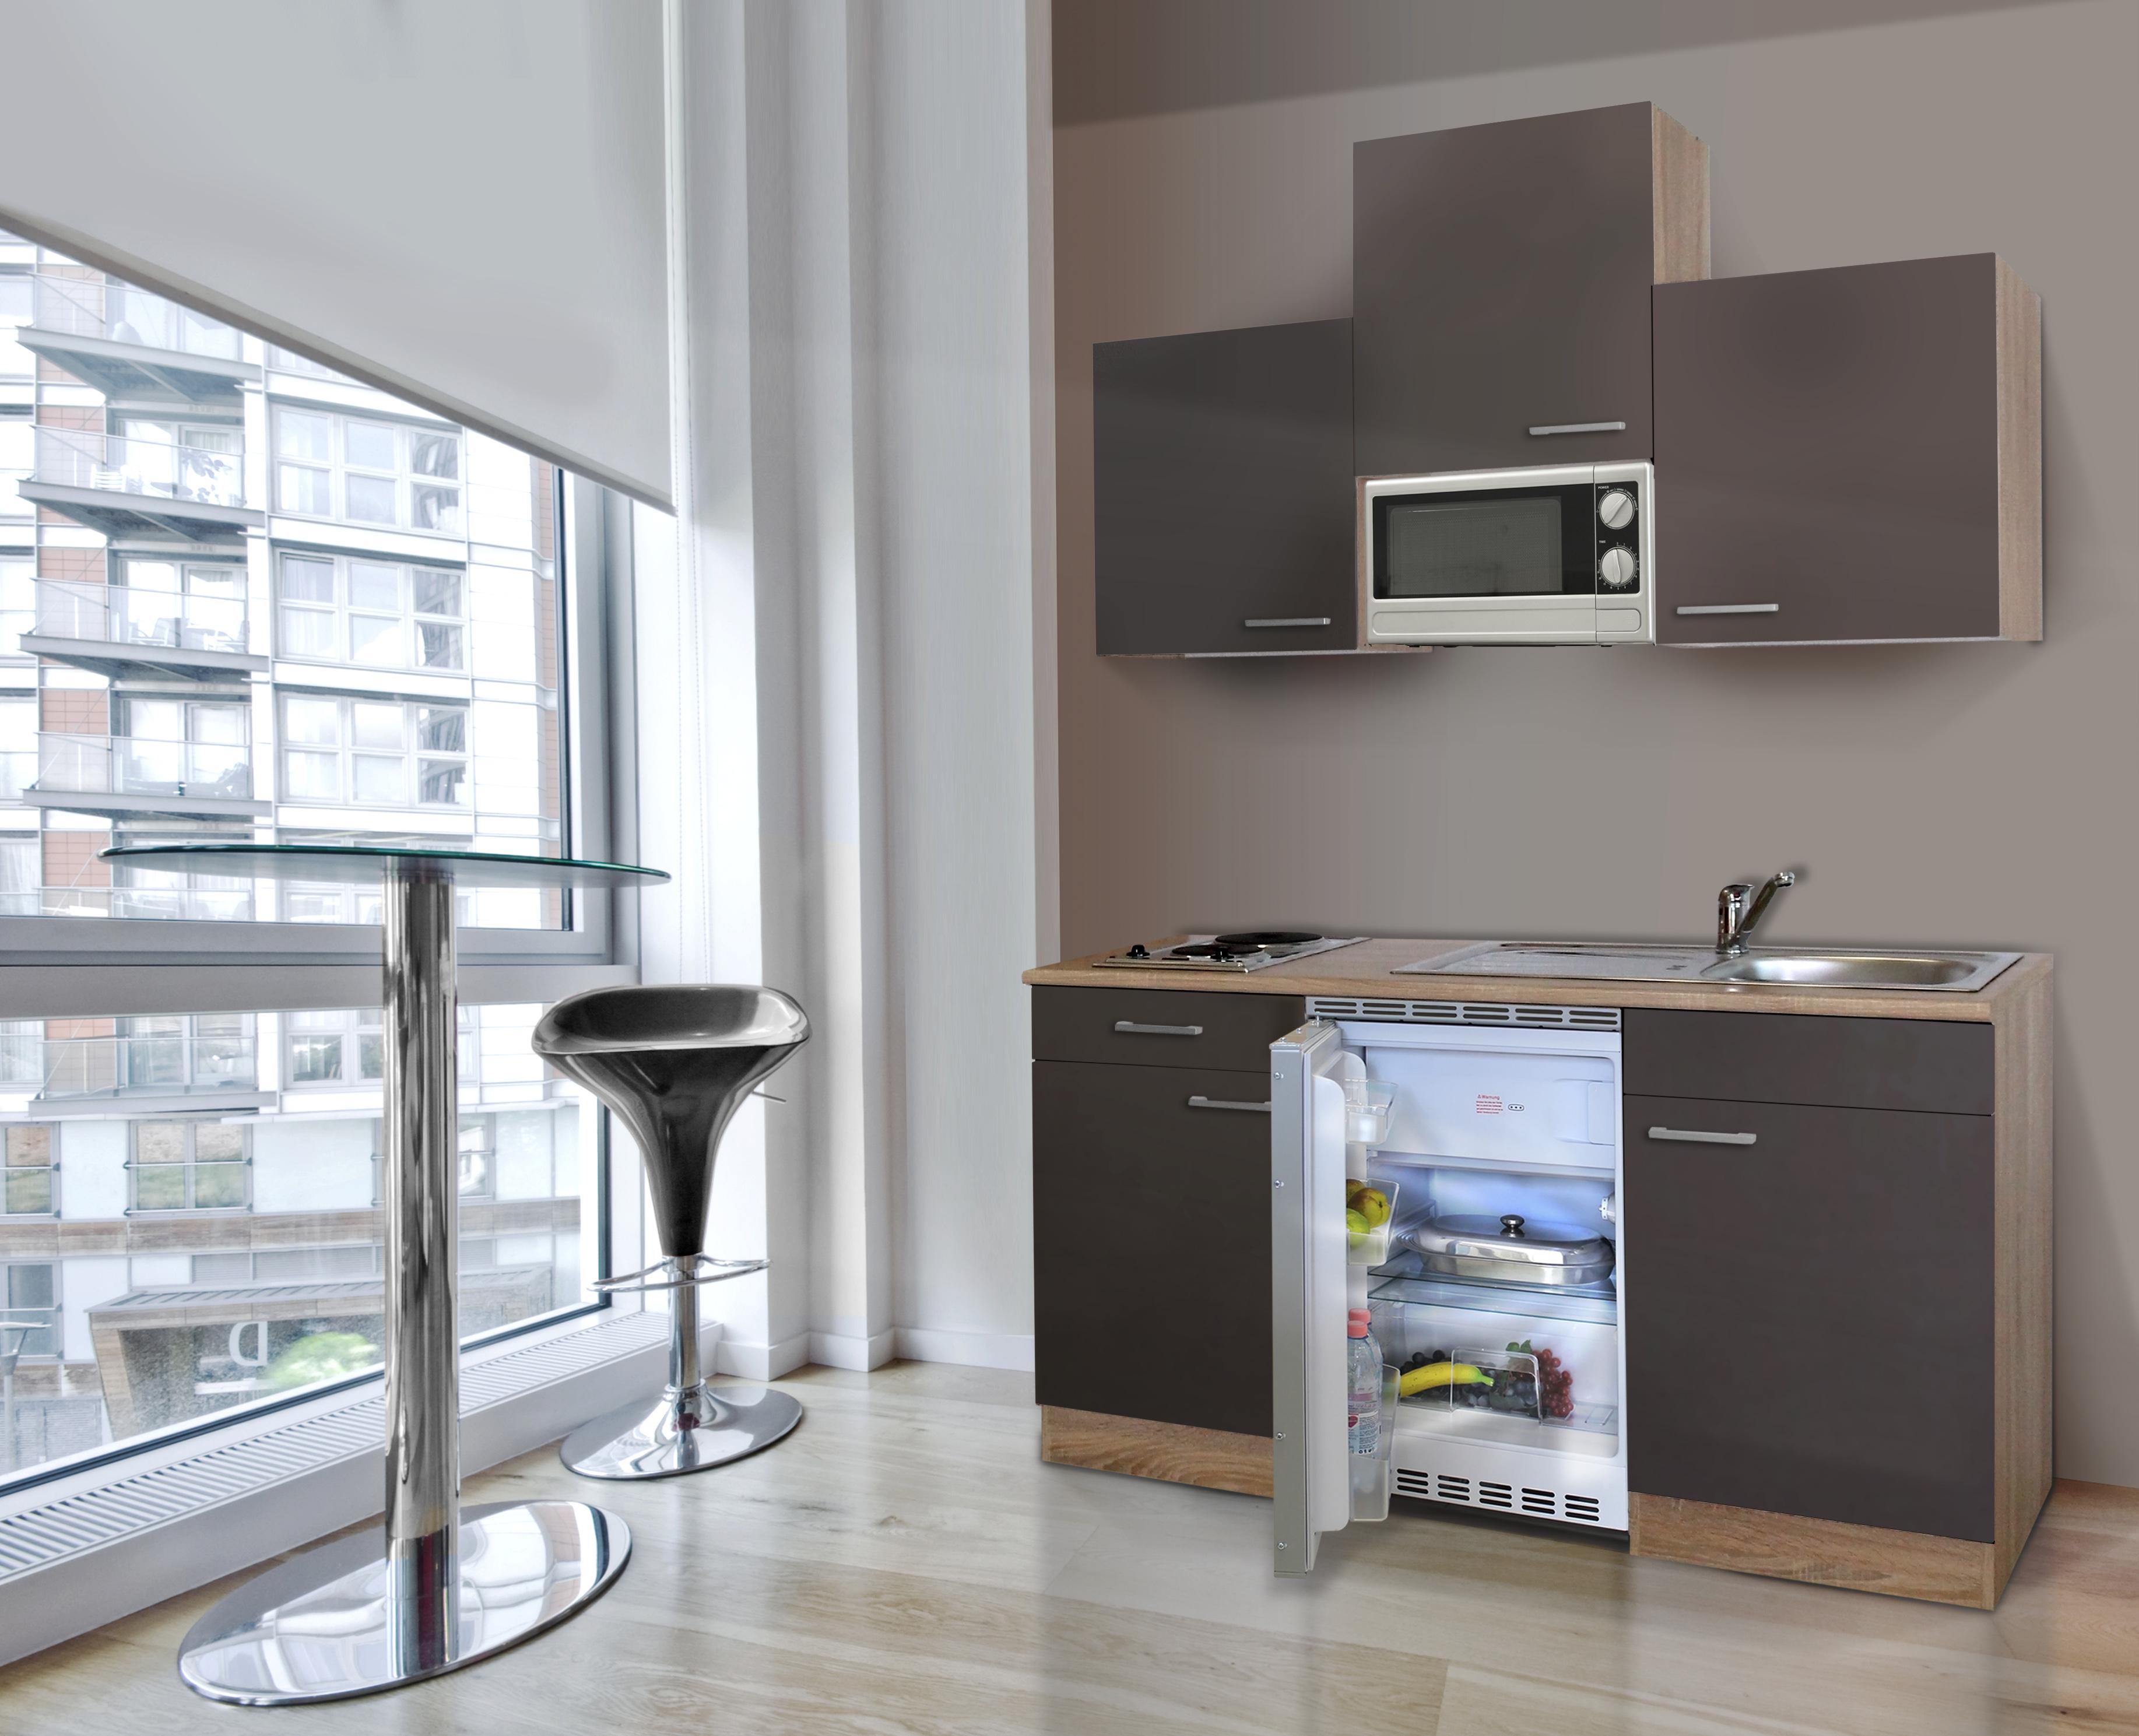 respekta singlek che minik che k che k chenzeile 150 cm eiche s gerau grau ceran ebay. Black Bedroom Furniture Sets. Home Design Ideas